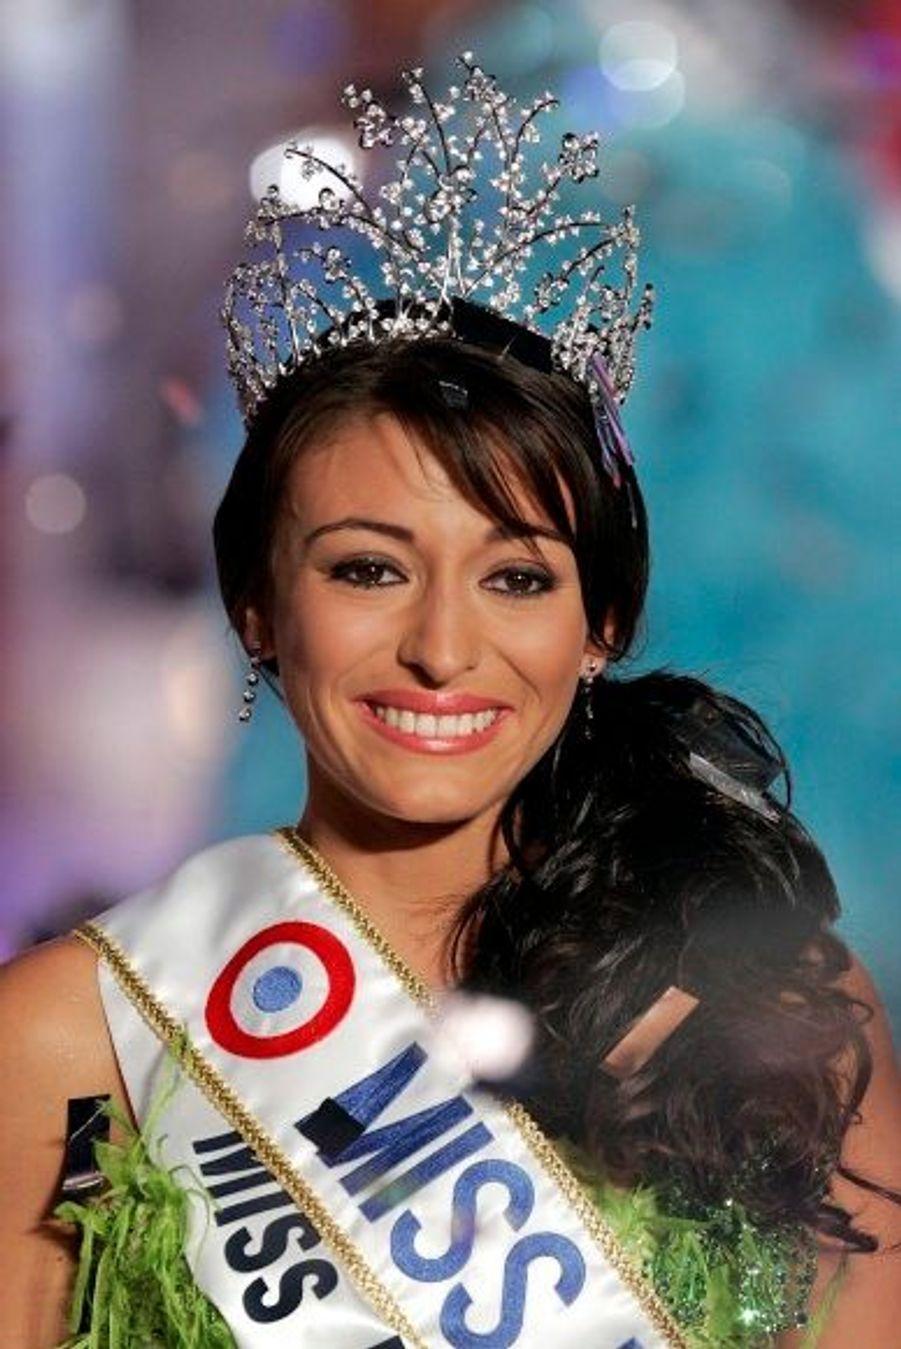 Rachel Legrain, Miss France 2007